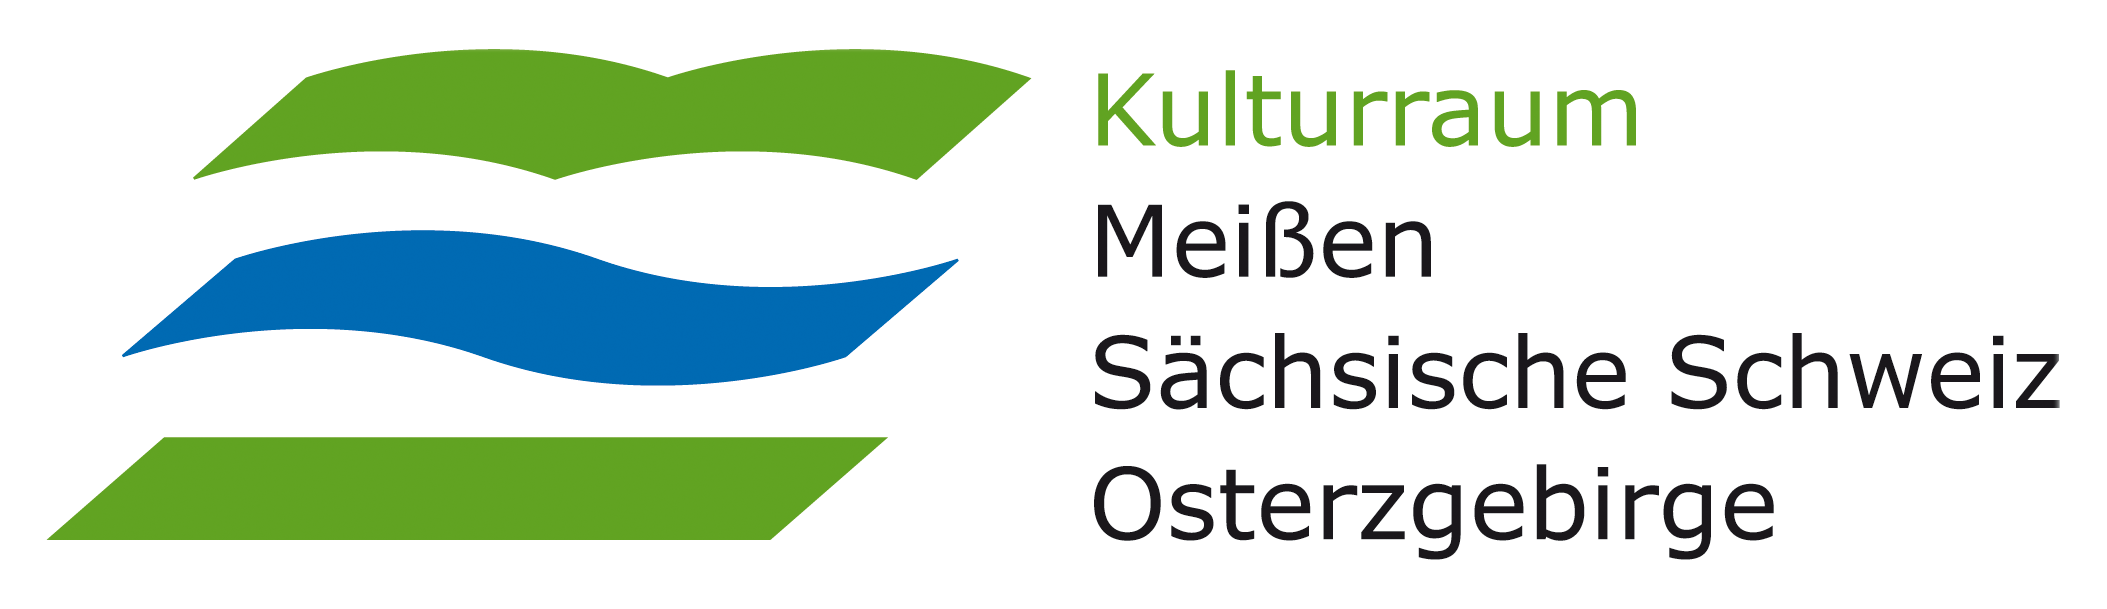 Logo Kulturraum Meissen.jpg